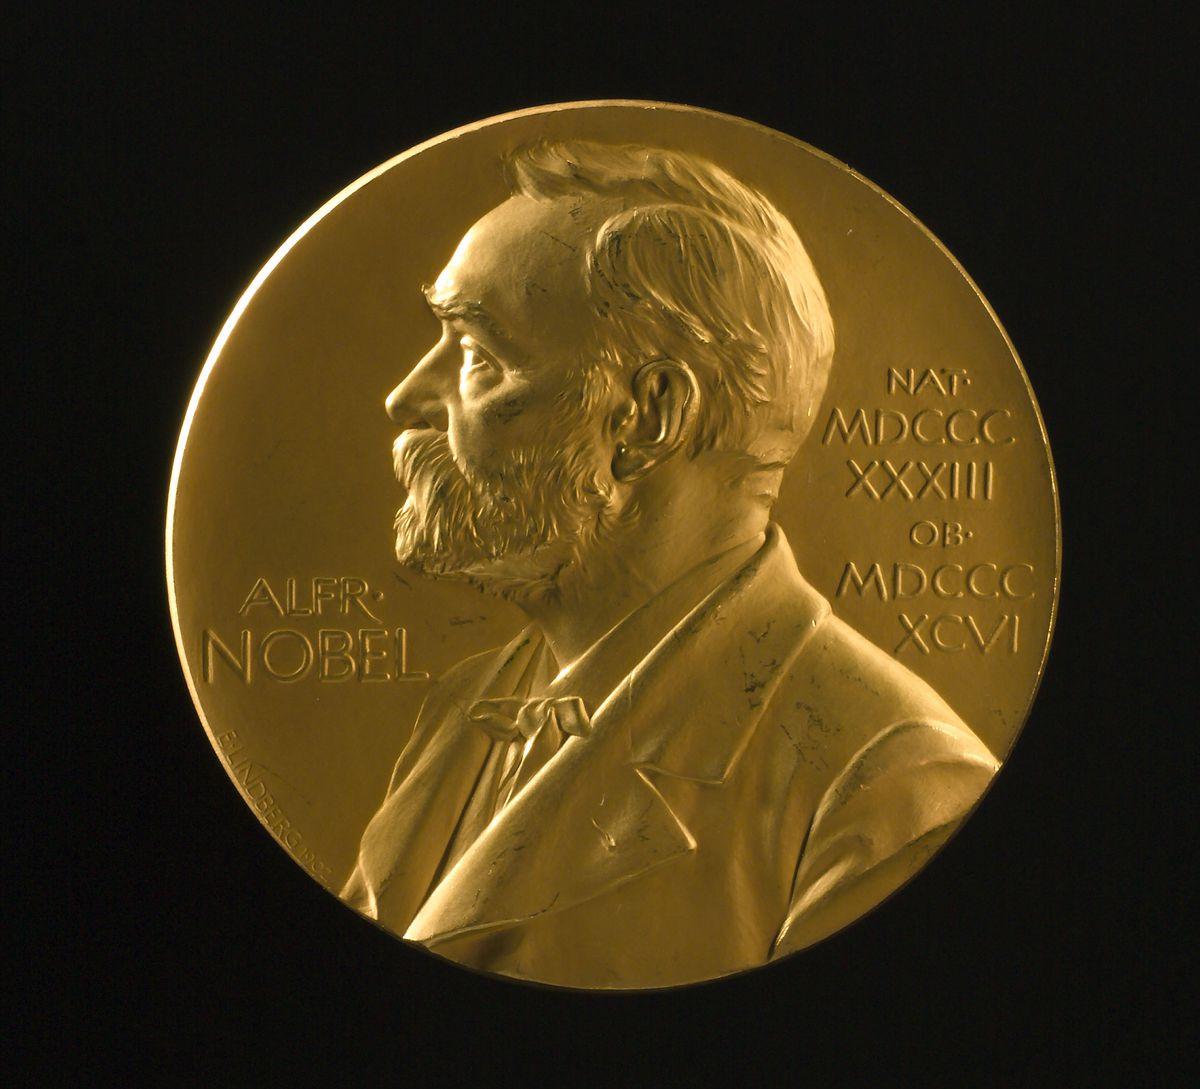 Nobel Prize medal Physics 1906